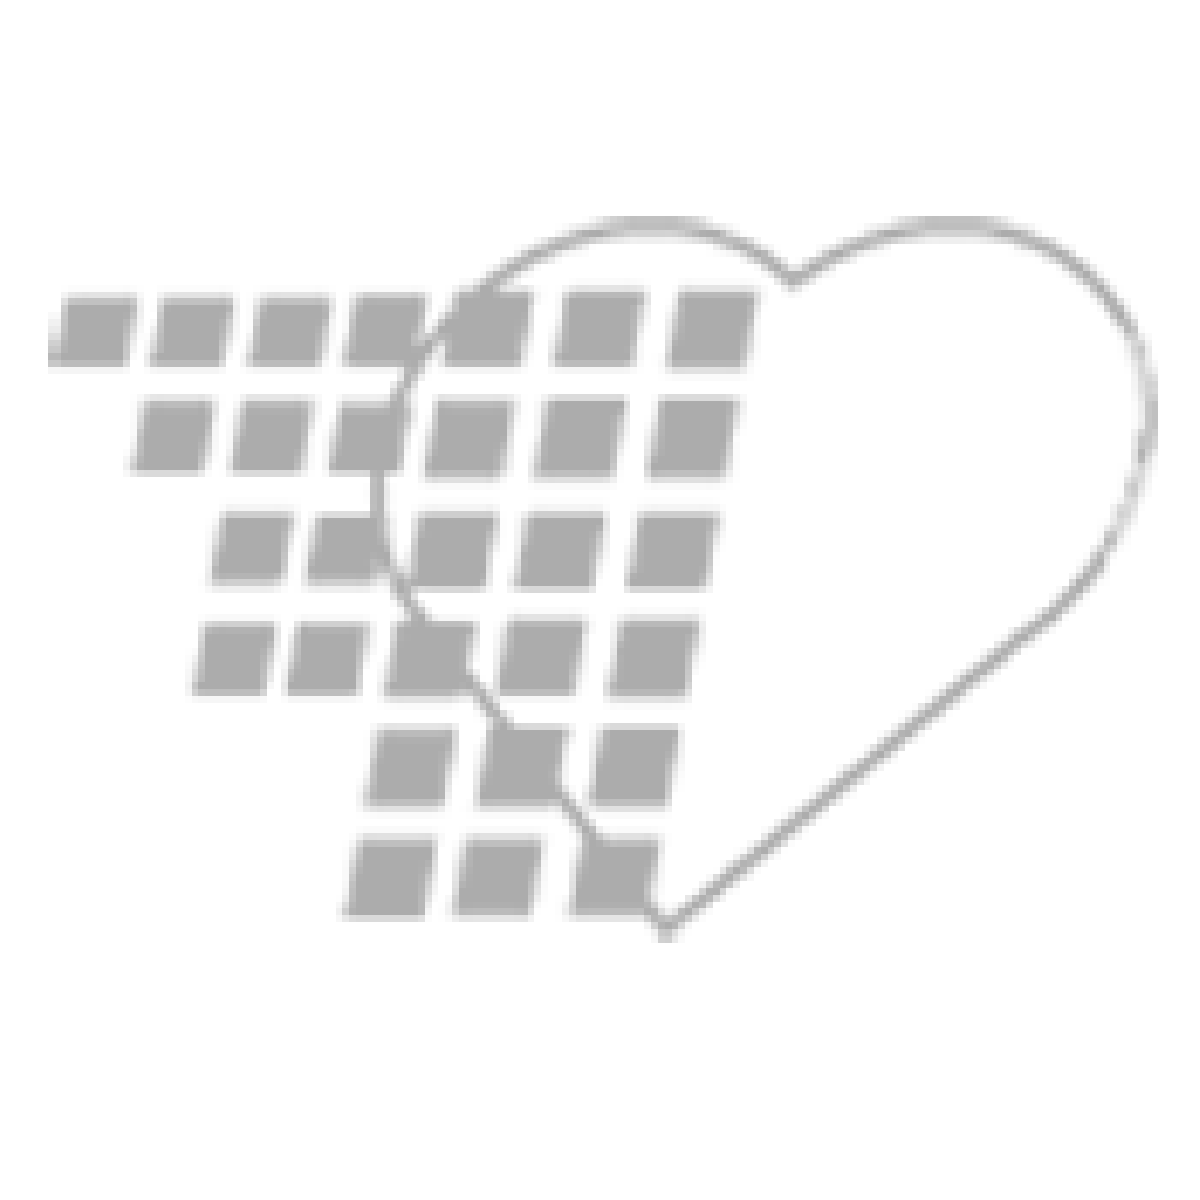 06-93-1428 - Demo Dose® Gentamicn 80mg/ vial 2mL